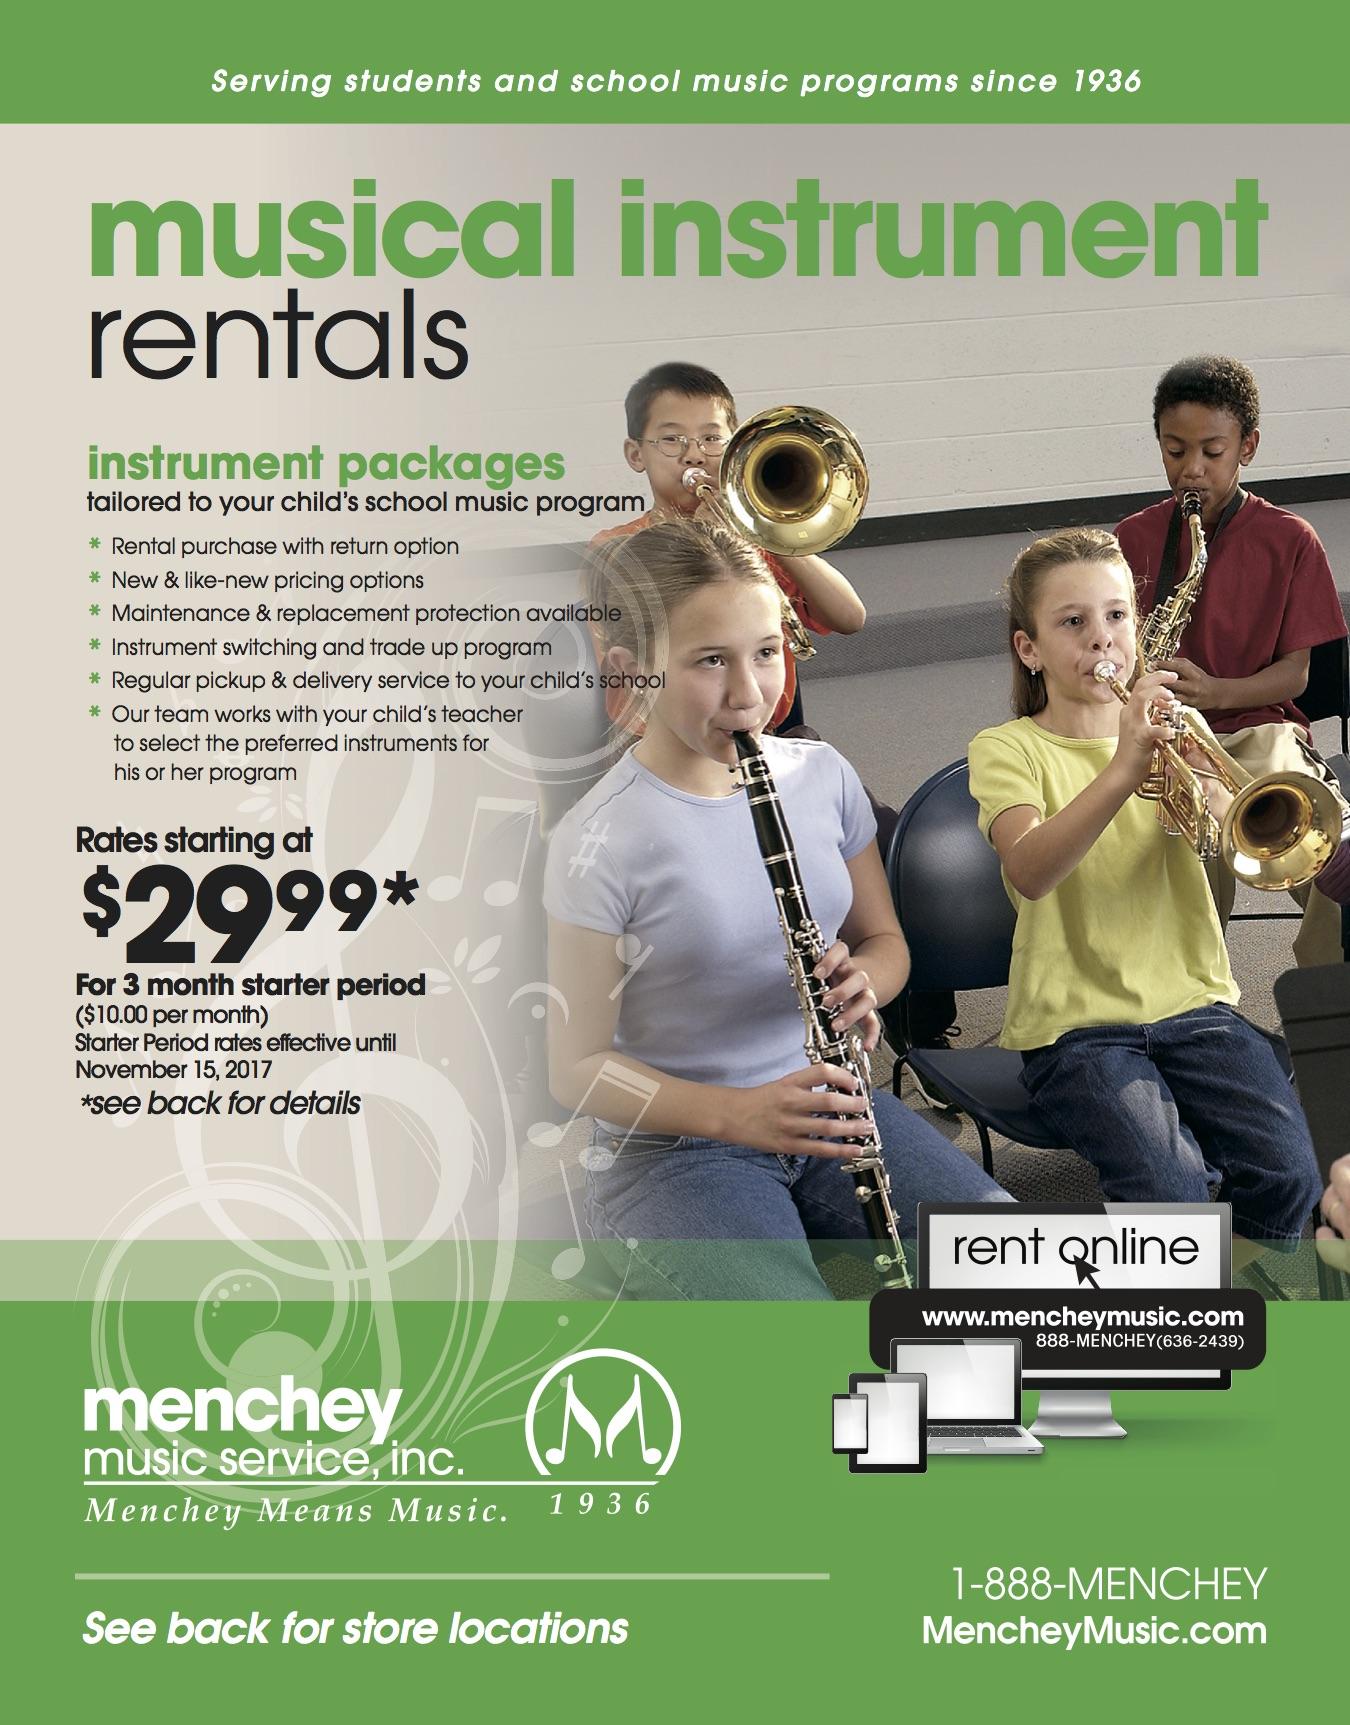 menchey music band rental flyer mrs brubaker music at hambright